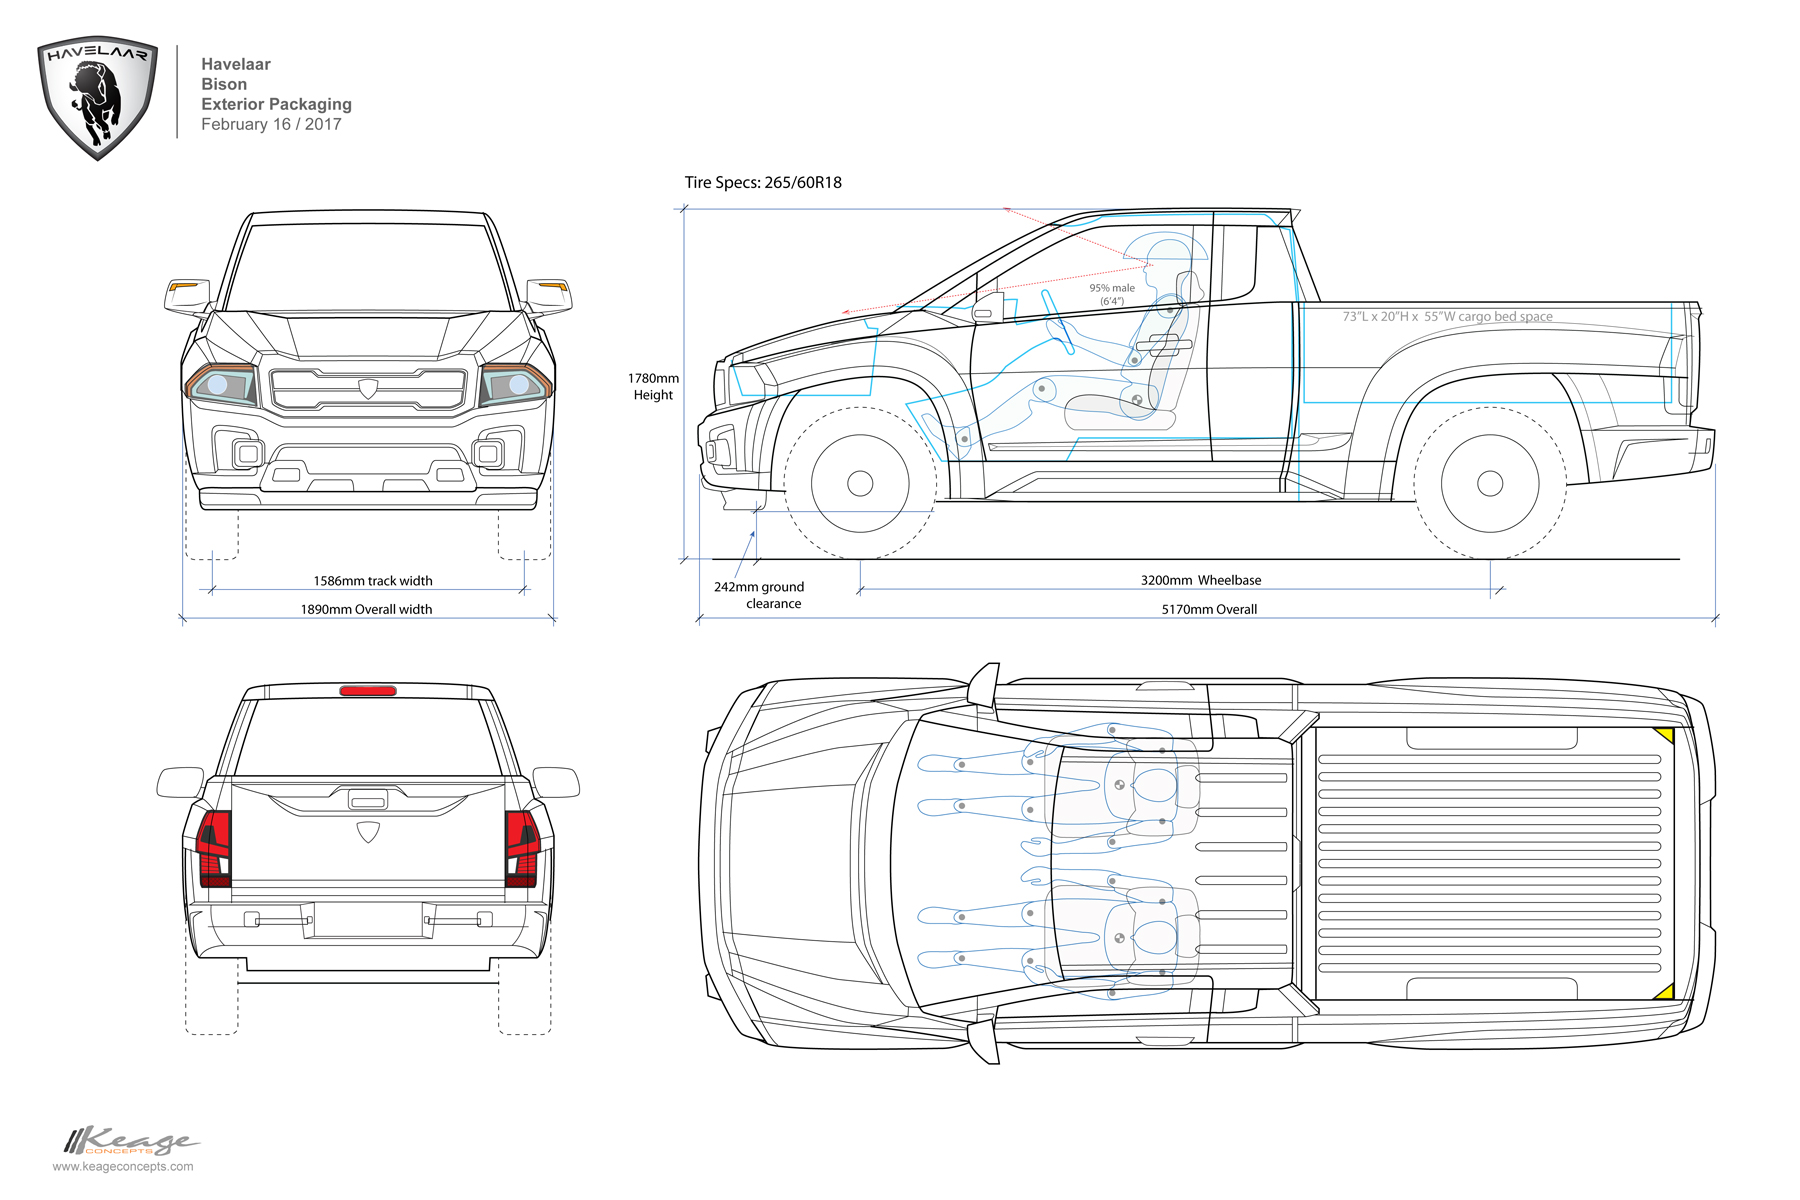 Havelaar-Bison Keage Concepts Calgary Alberta Automotive Design